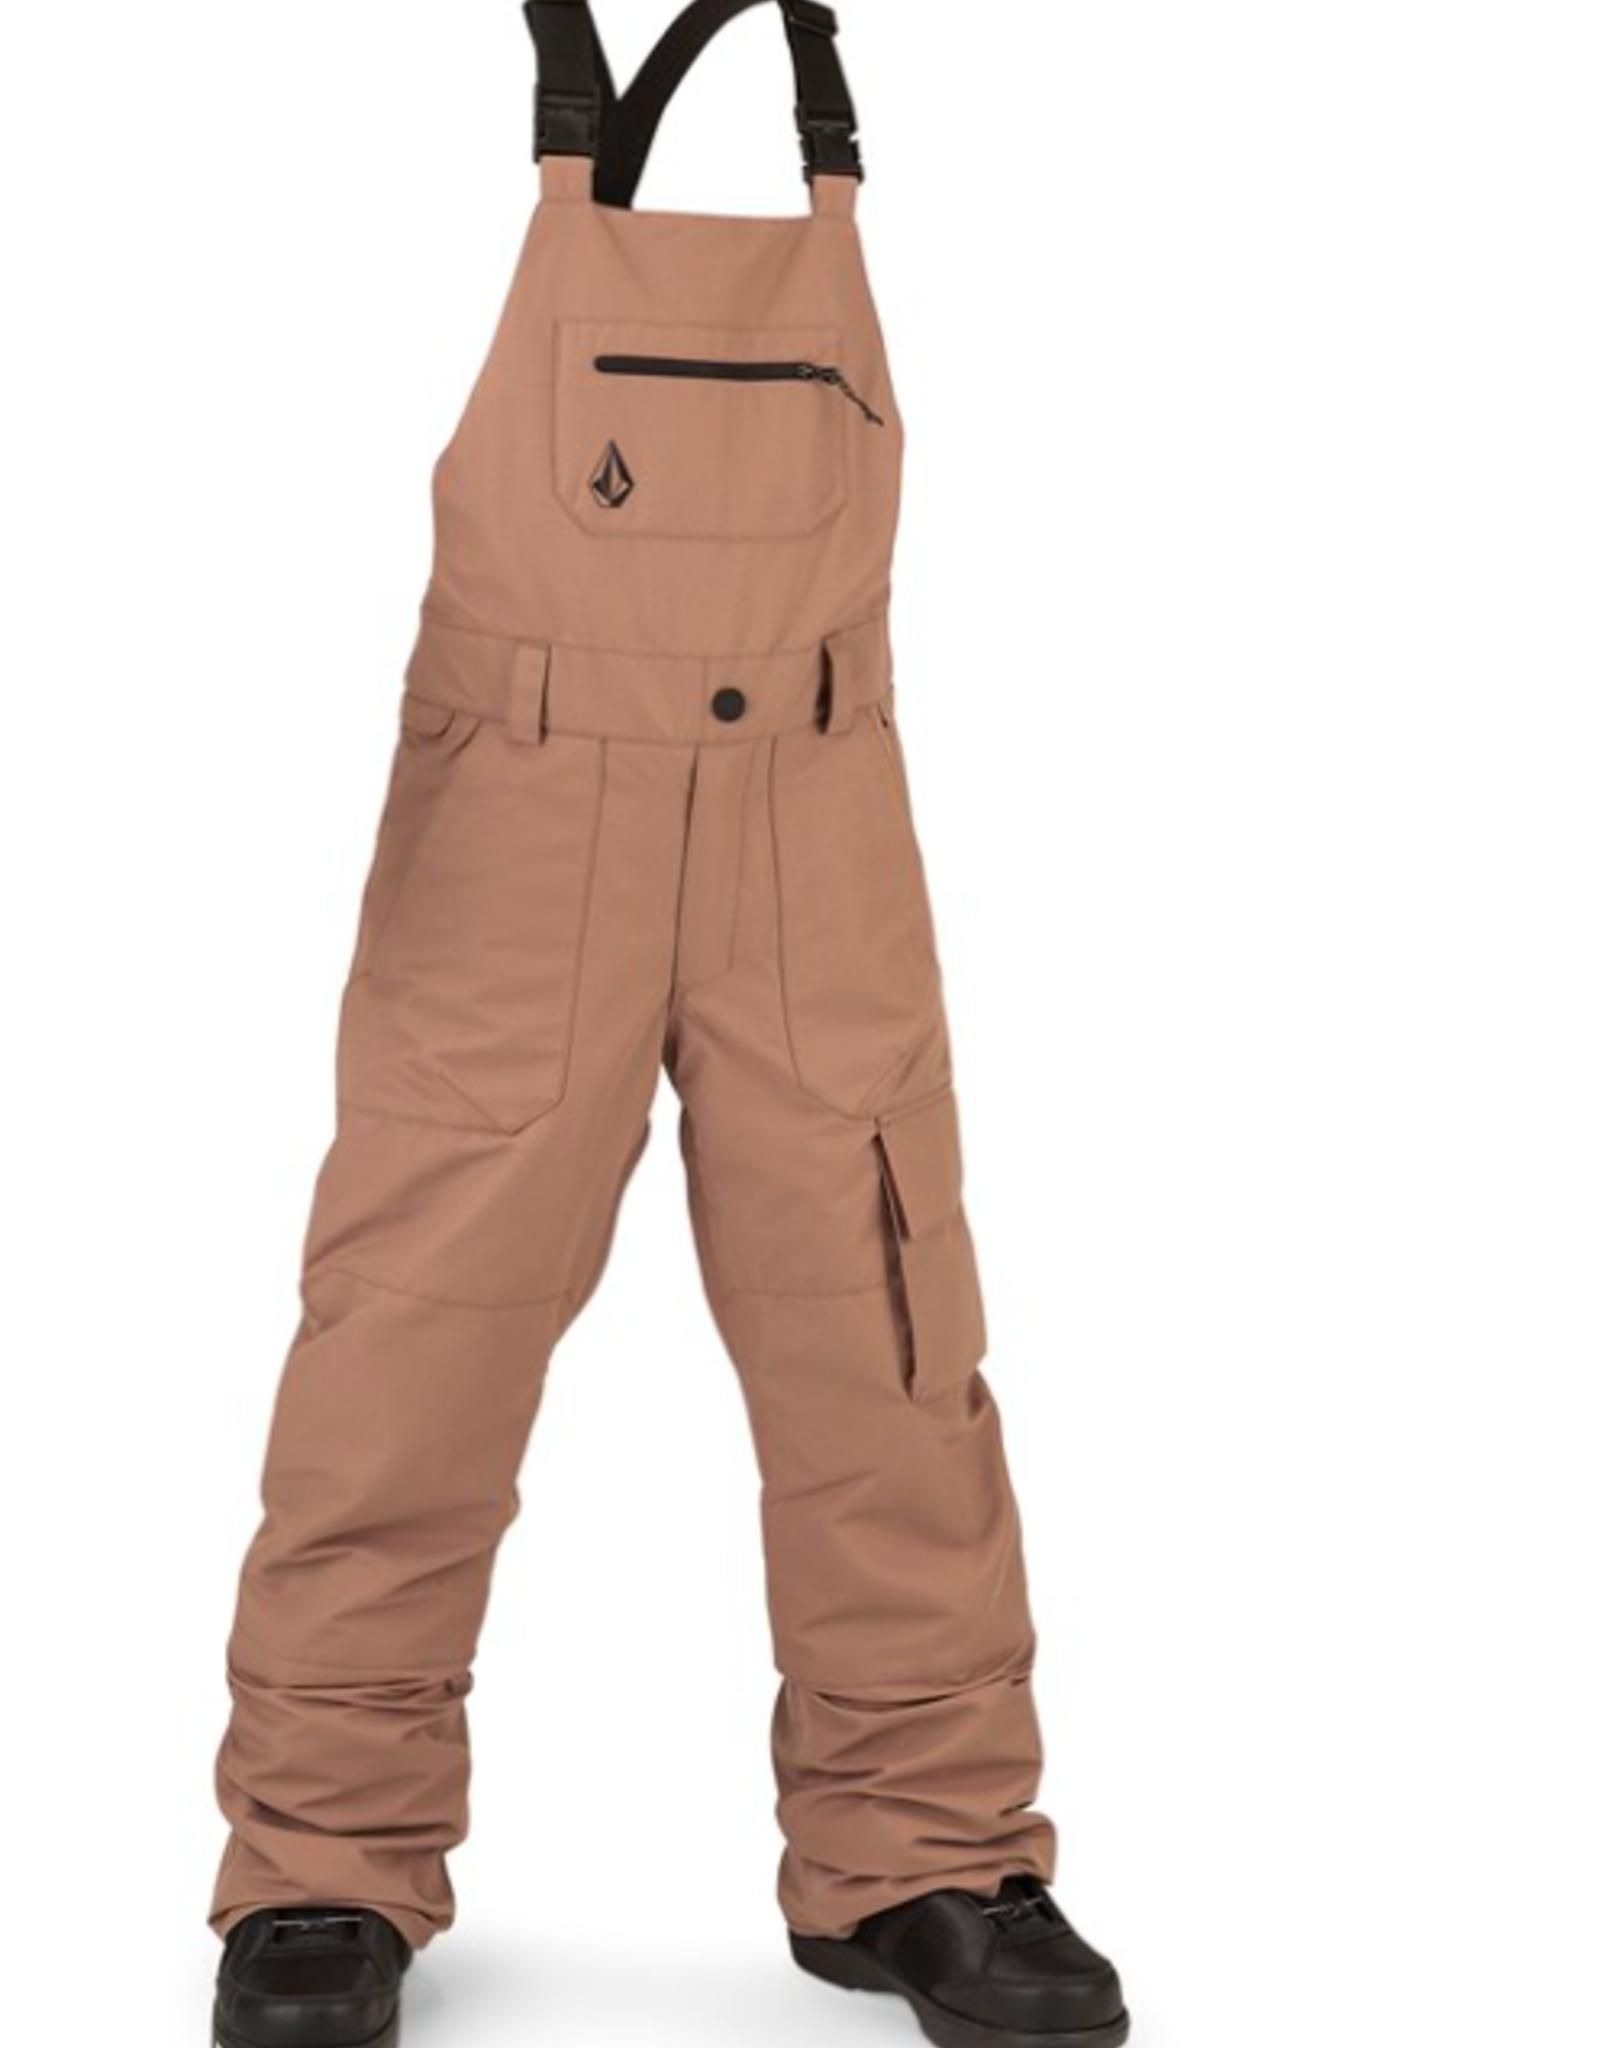 Volcom Kid's Barkley Bib Overall Pants Coffee 2022